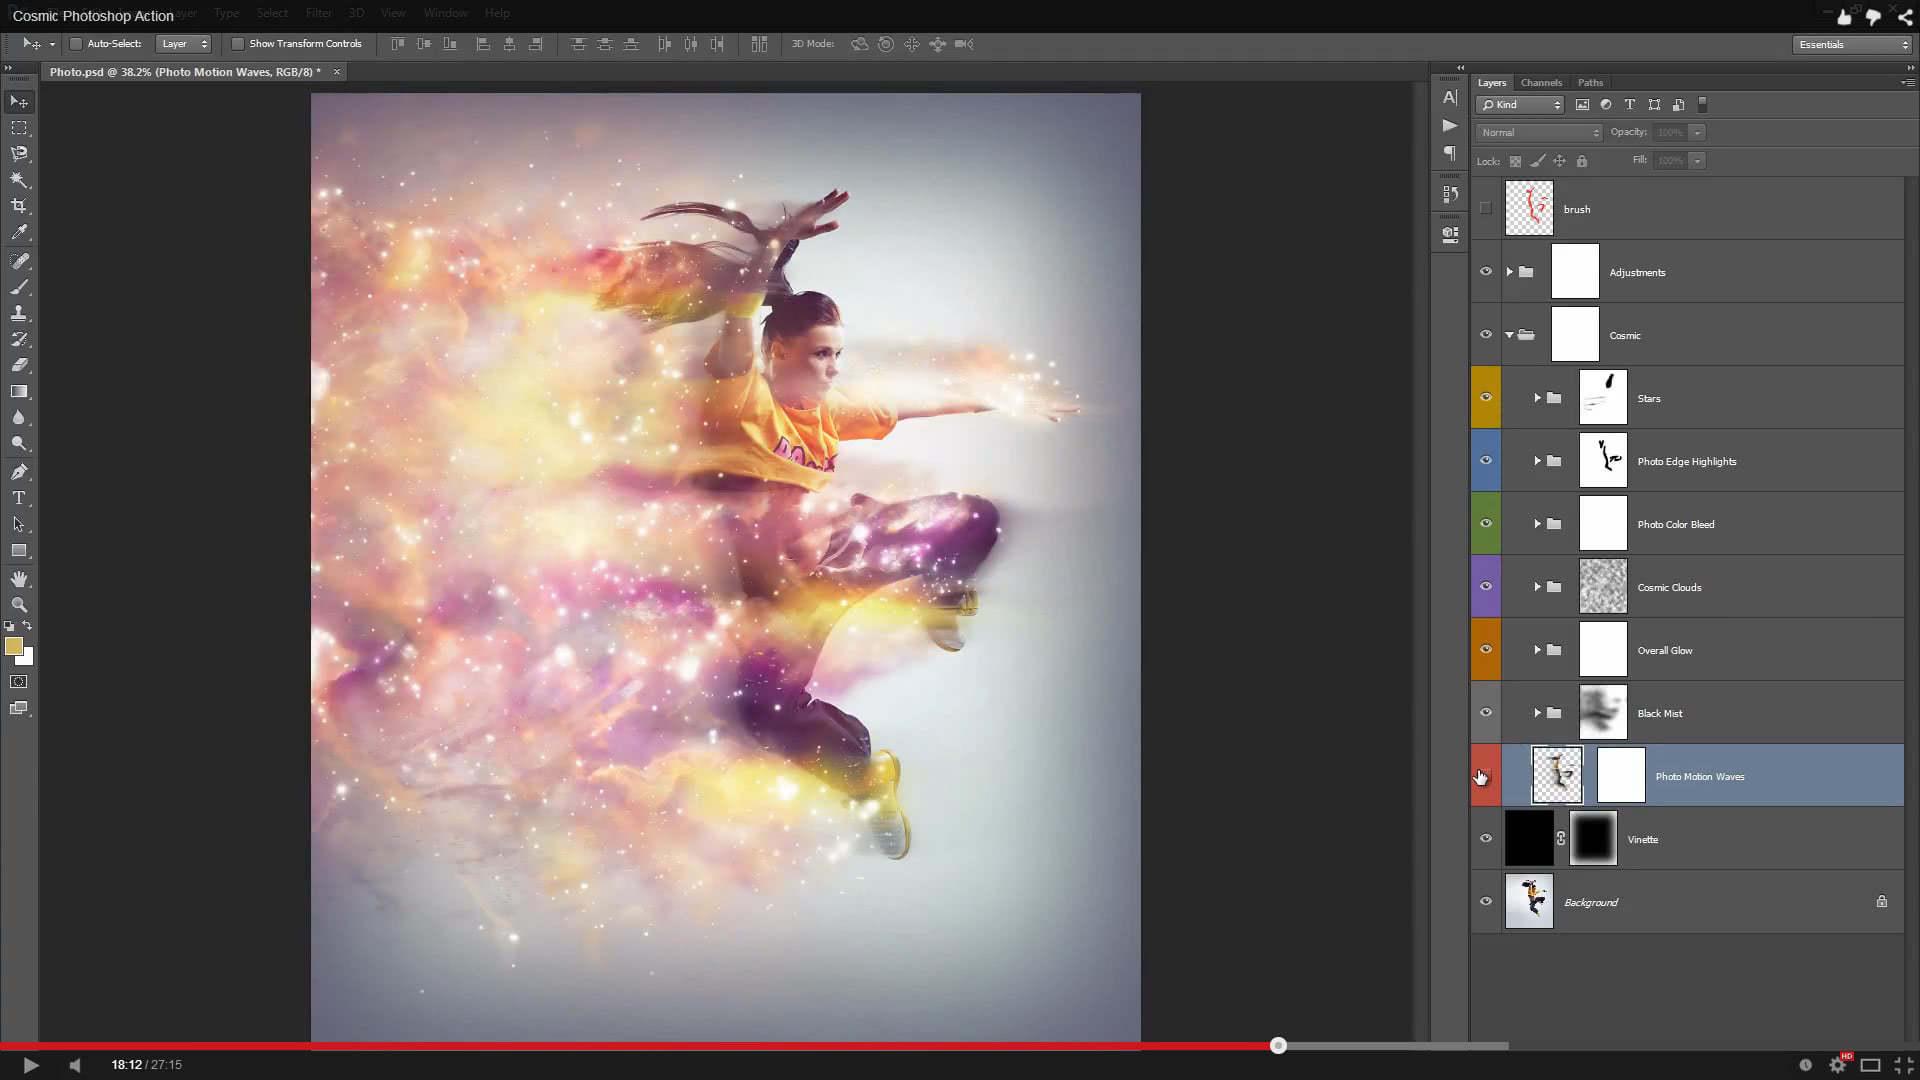 Cosmic Photoshop Action - 1